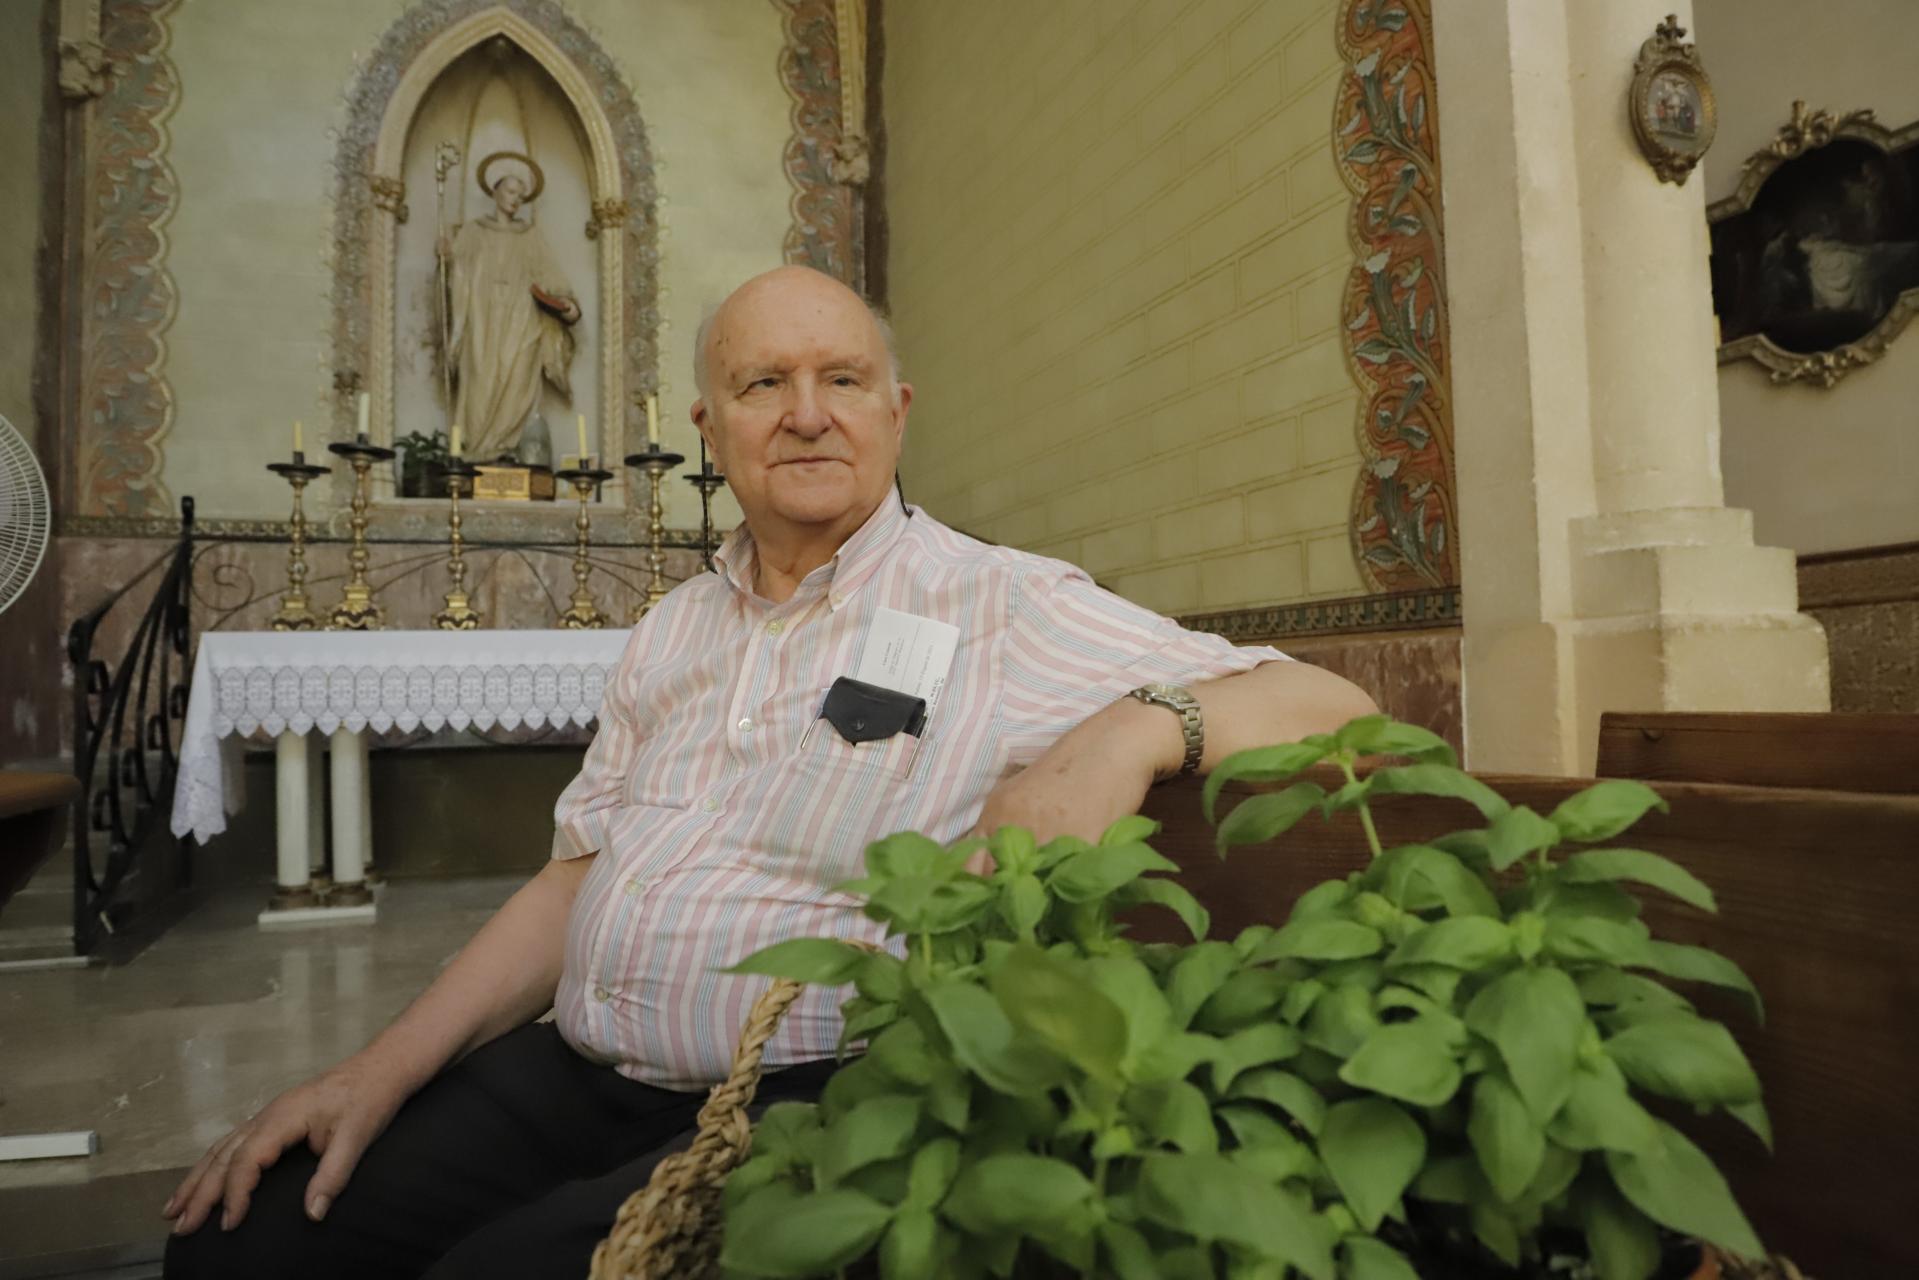 palma josep amengual padre superior monasterio la real foto morey